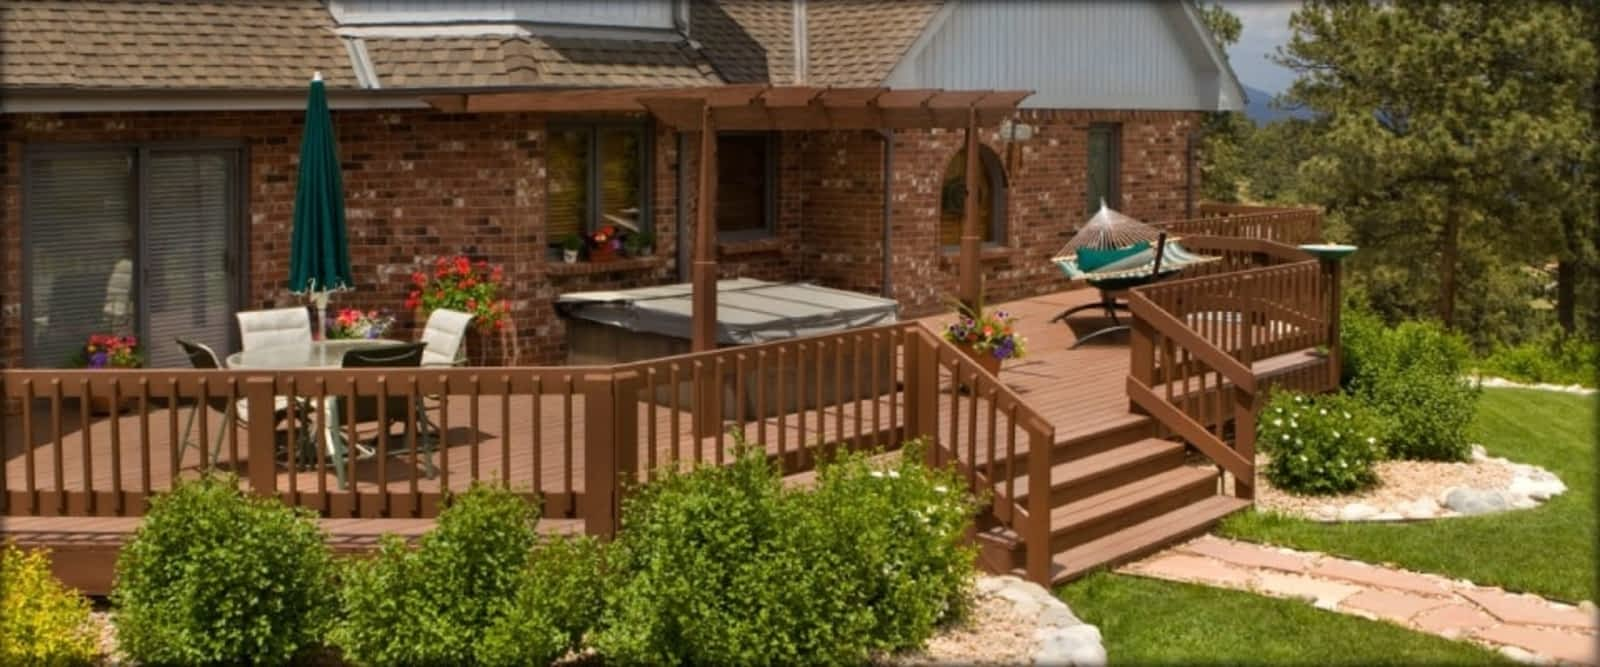 Victoria Garden Sprinkler Co Ltd - Opening Hours - 6670E Bertram Pl ...